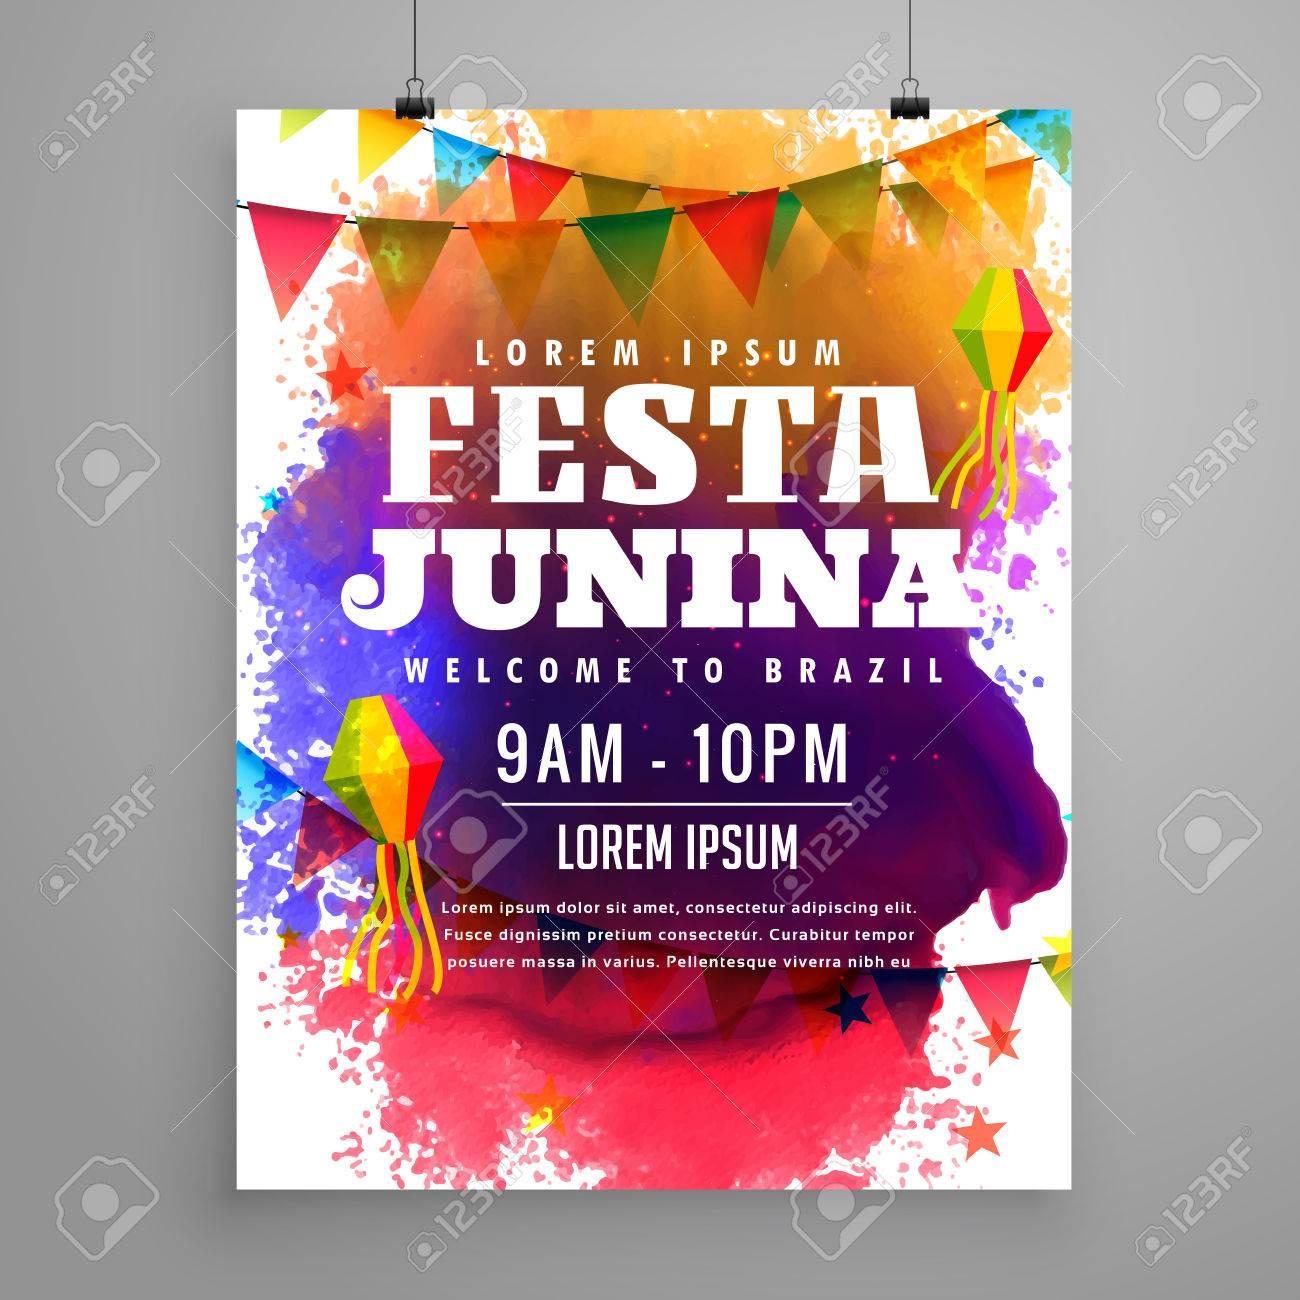 Festa Junina Invitation Flyer Template Design Royalty Free Cliparts ...